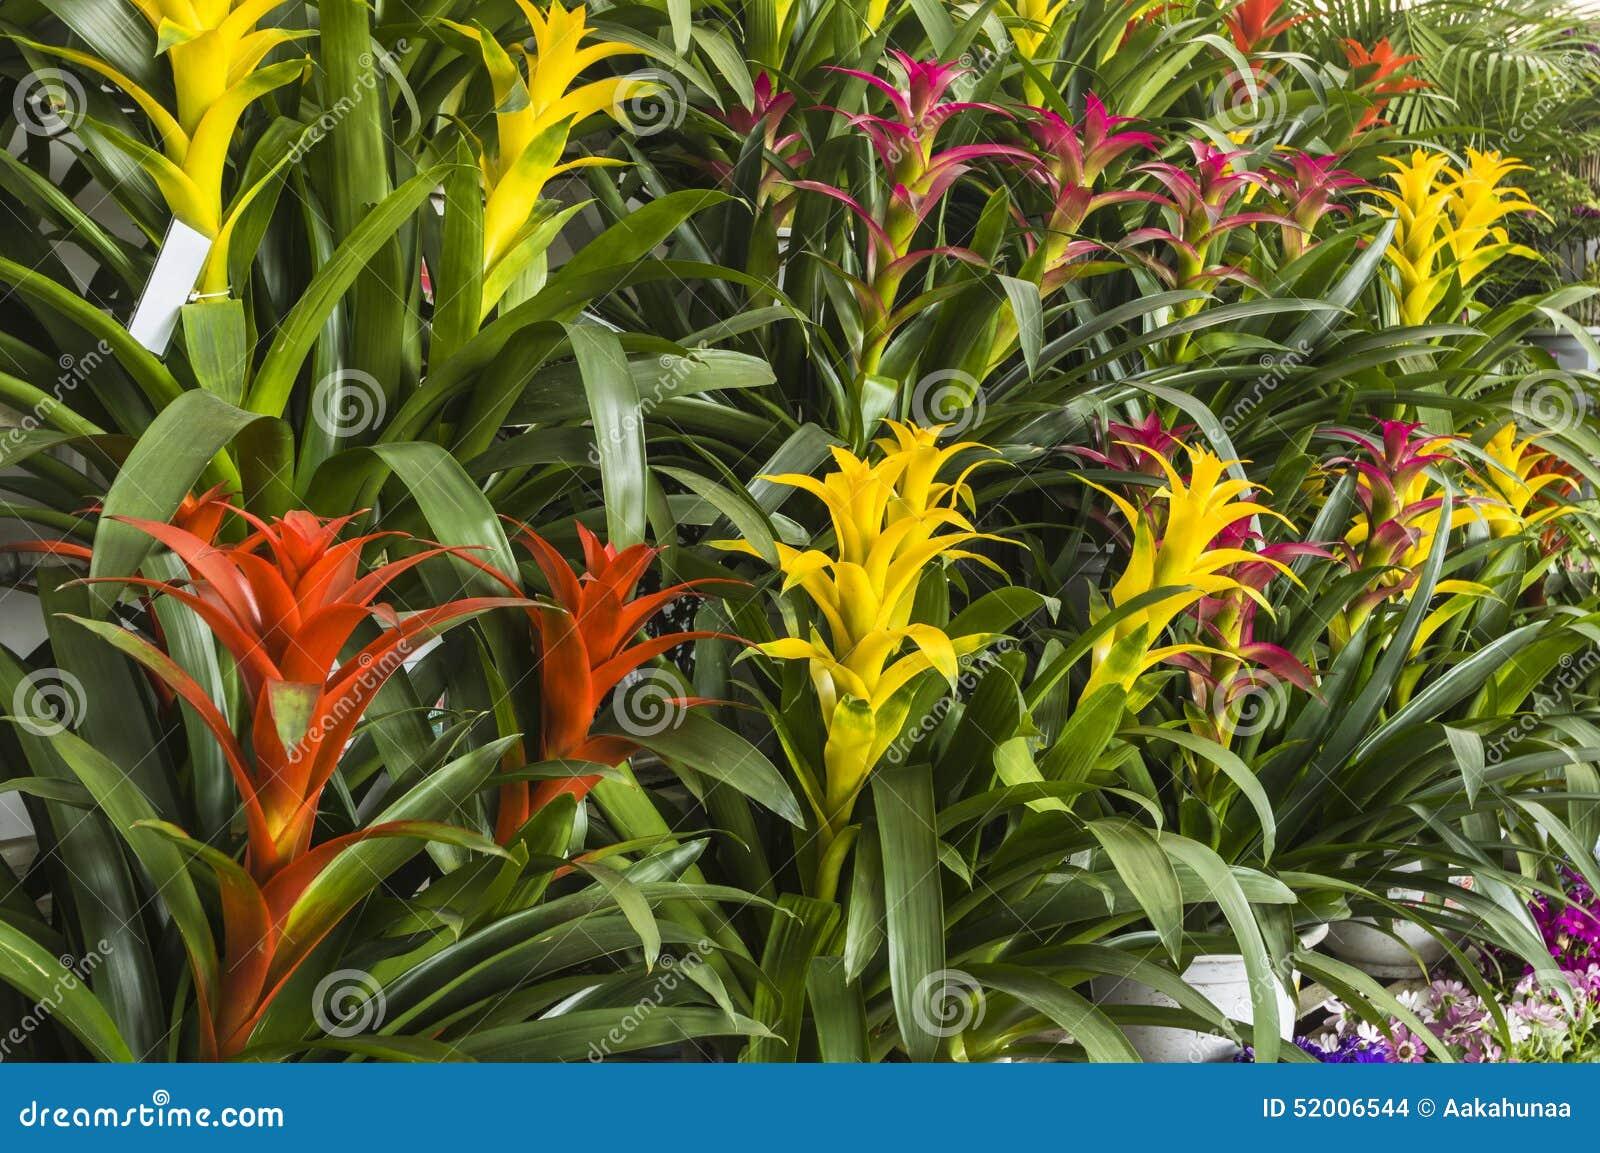 fleur d 39 ananas photo stock image du lumineux centrales. Black Bedroom Furniture Sets. Home Design Ideas